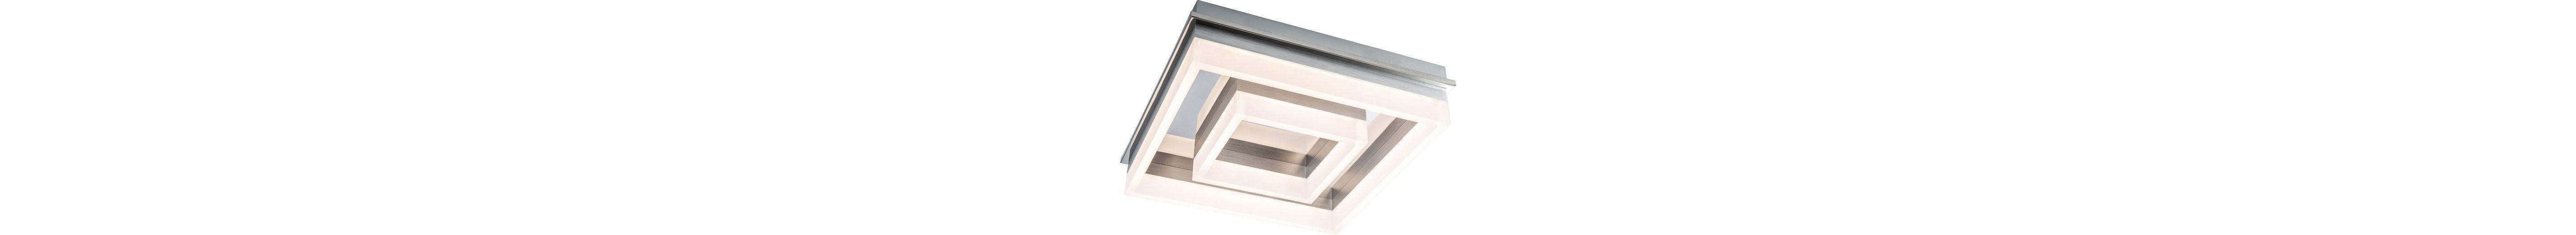 Nino Leuchten LED-Deckenleuchte, »LENNOX«